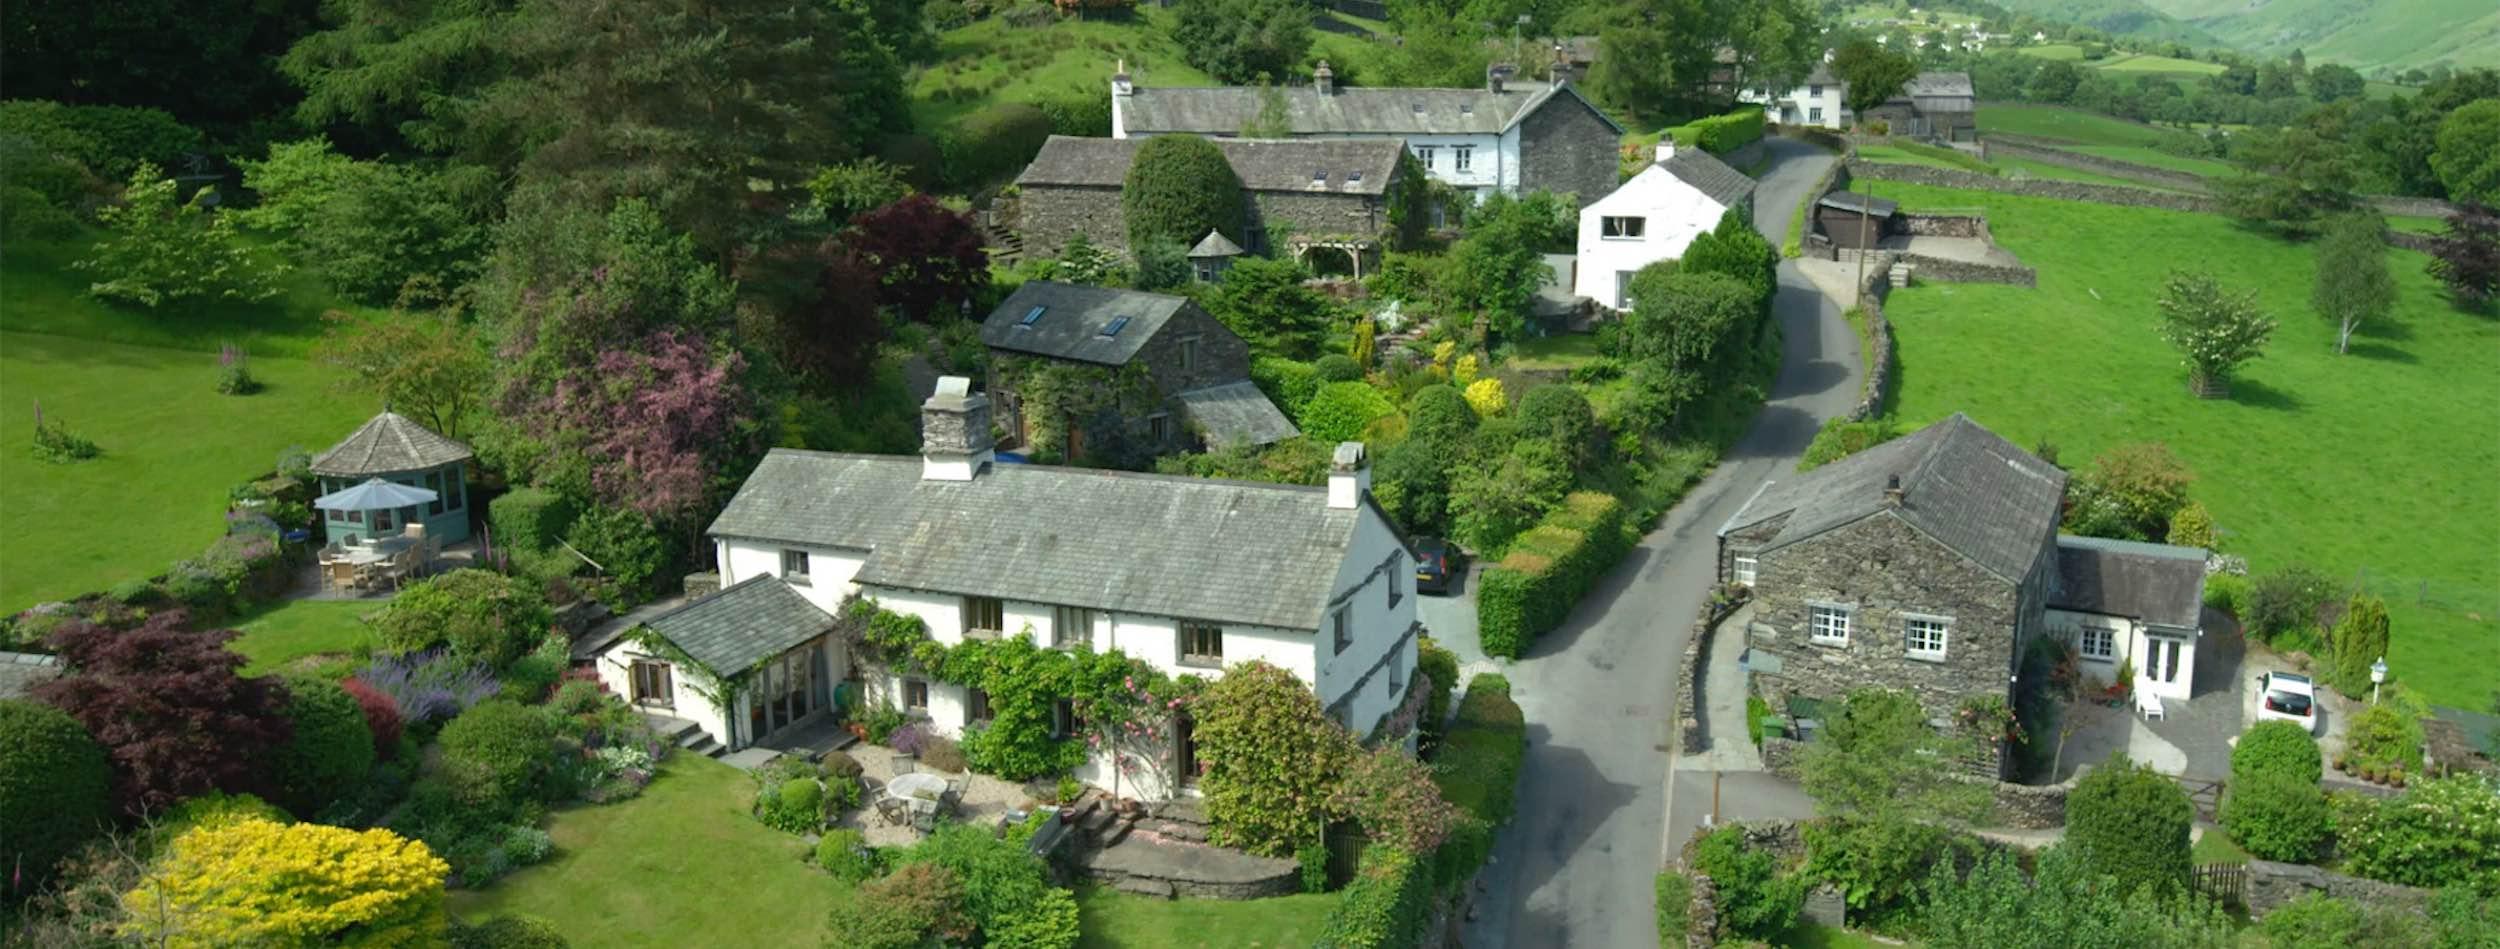 Townfoot Farmhouse, Troutbeck